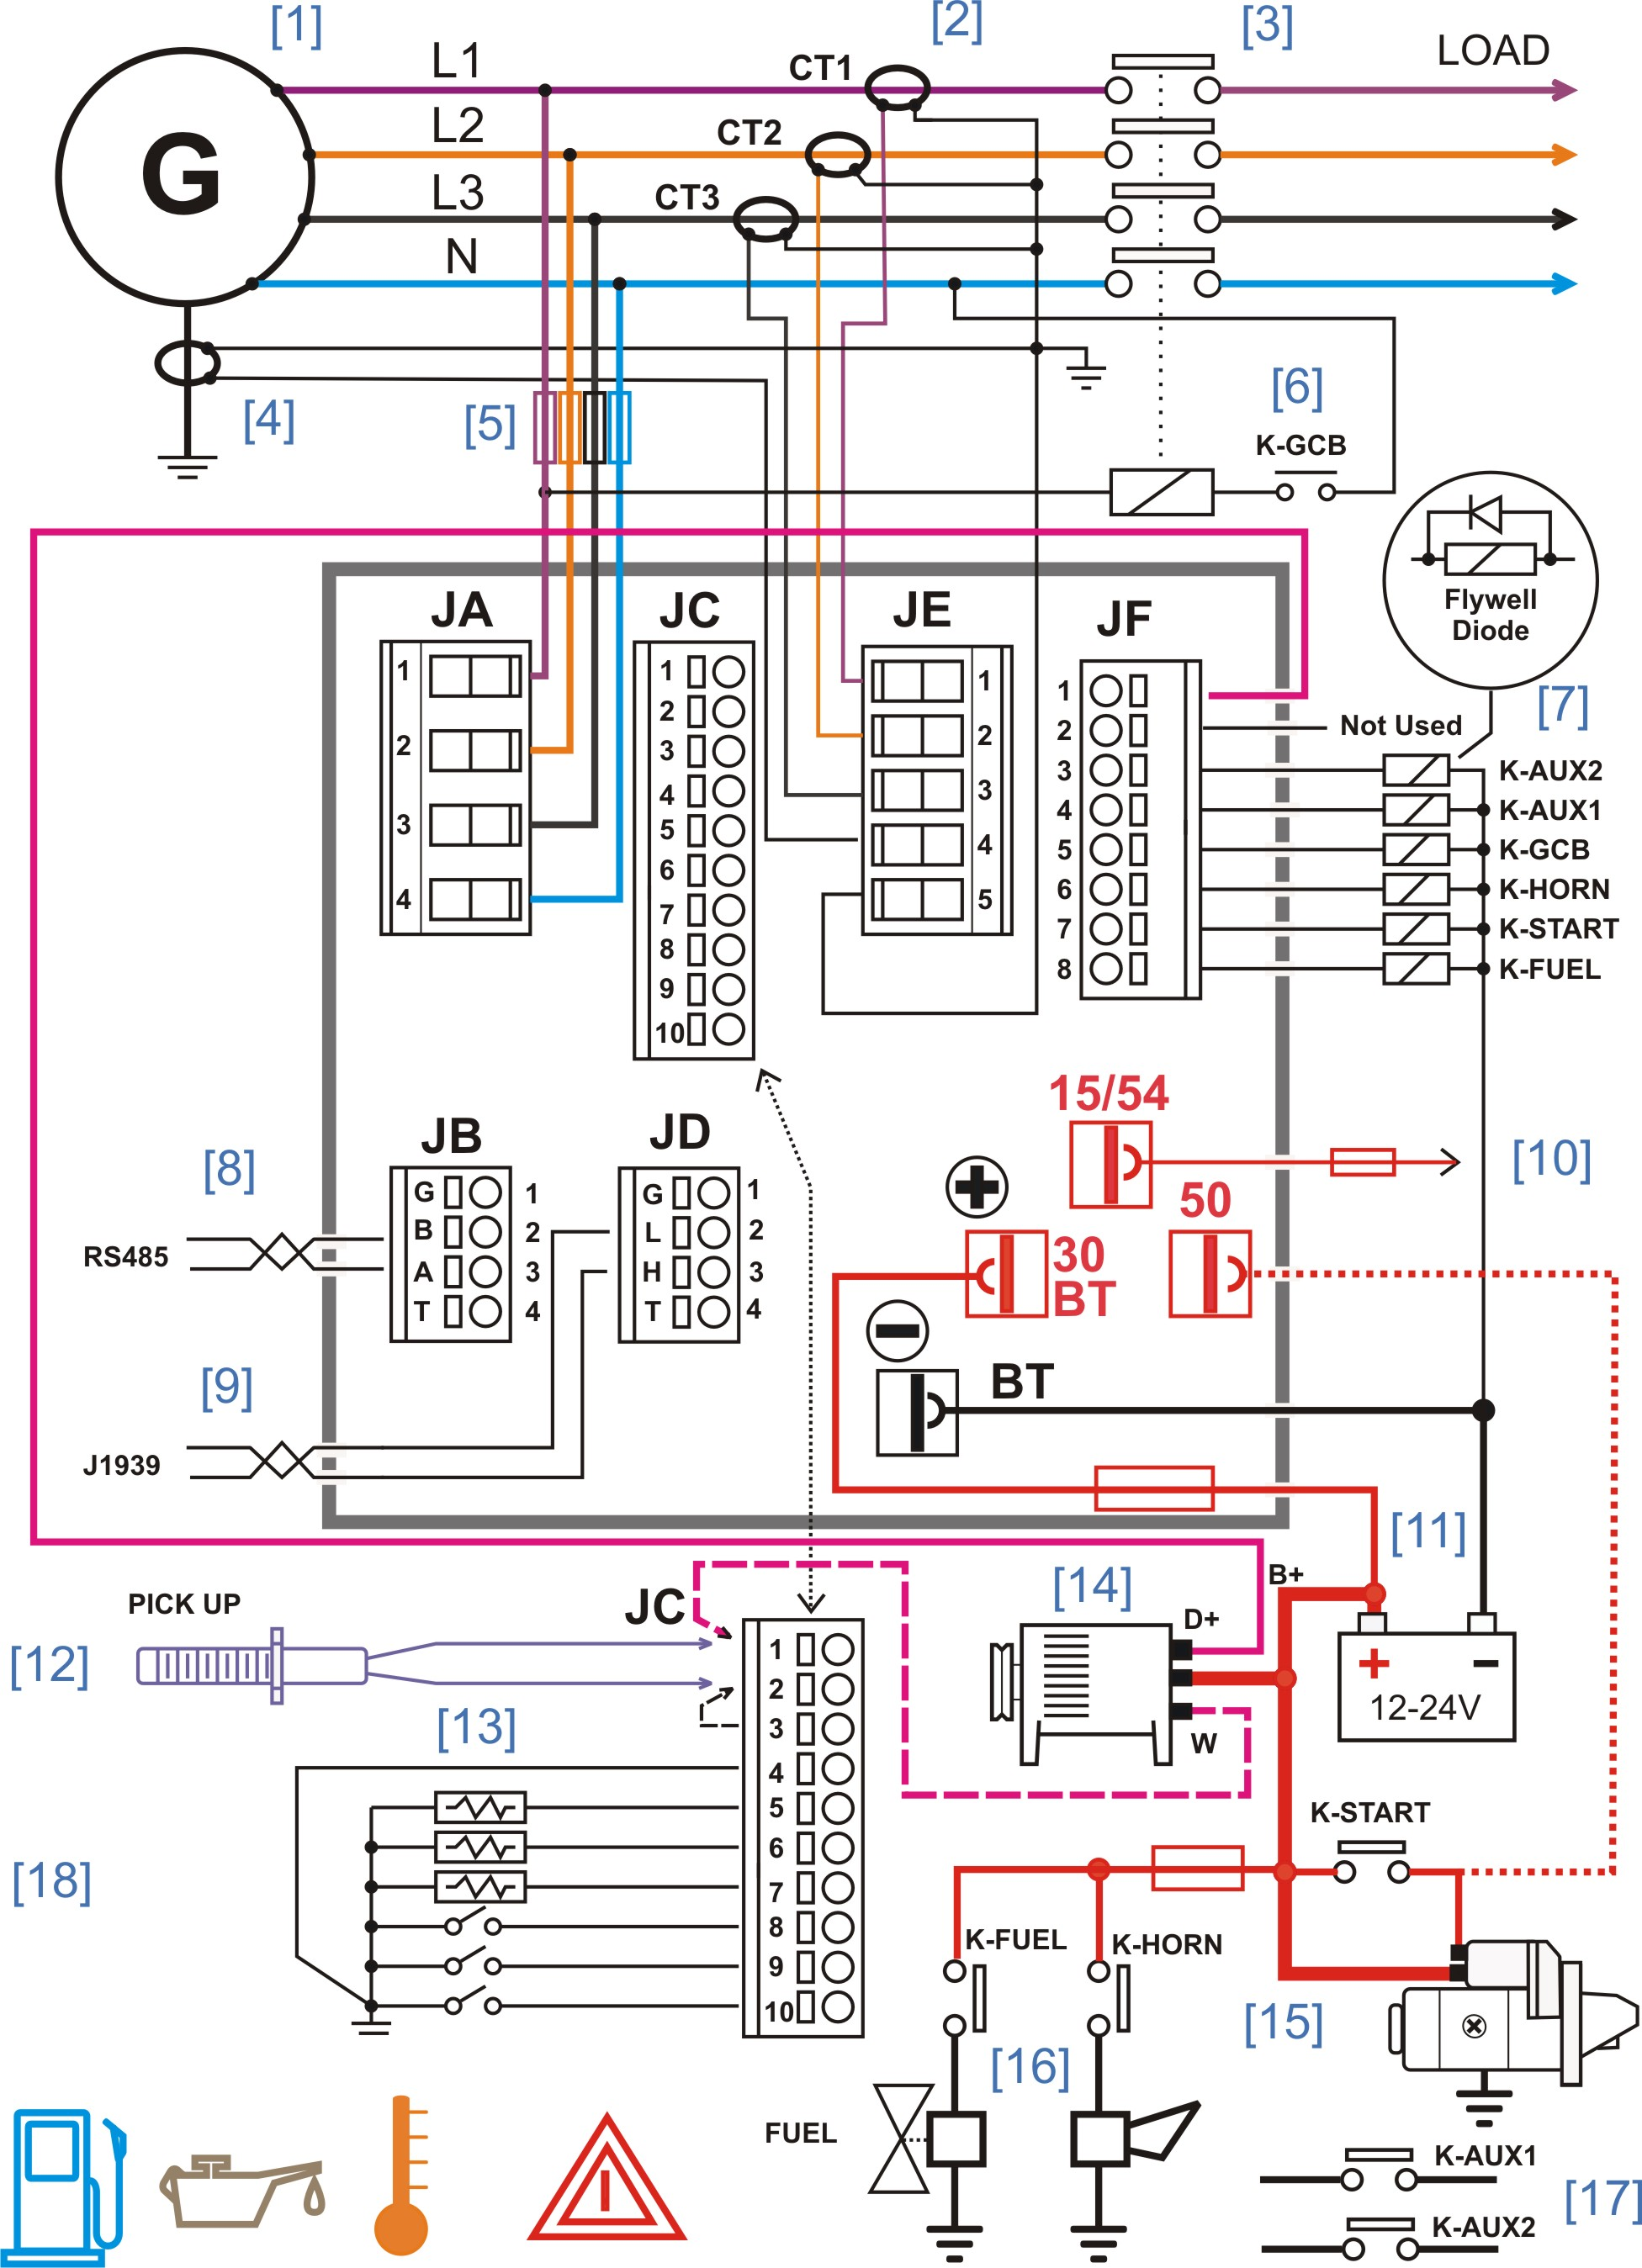 generator controller wiring diagram – Generator ControllersGenerator Controllers